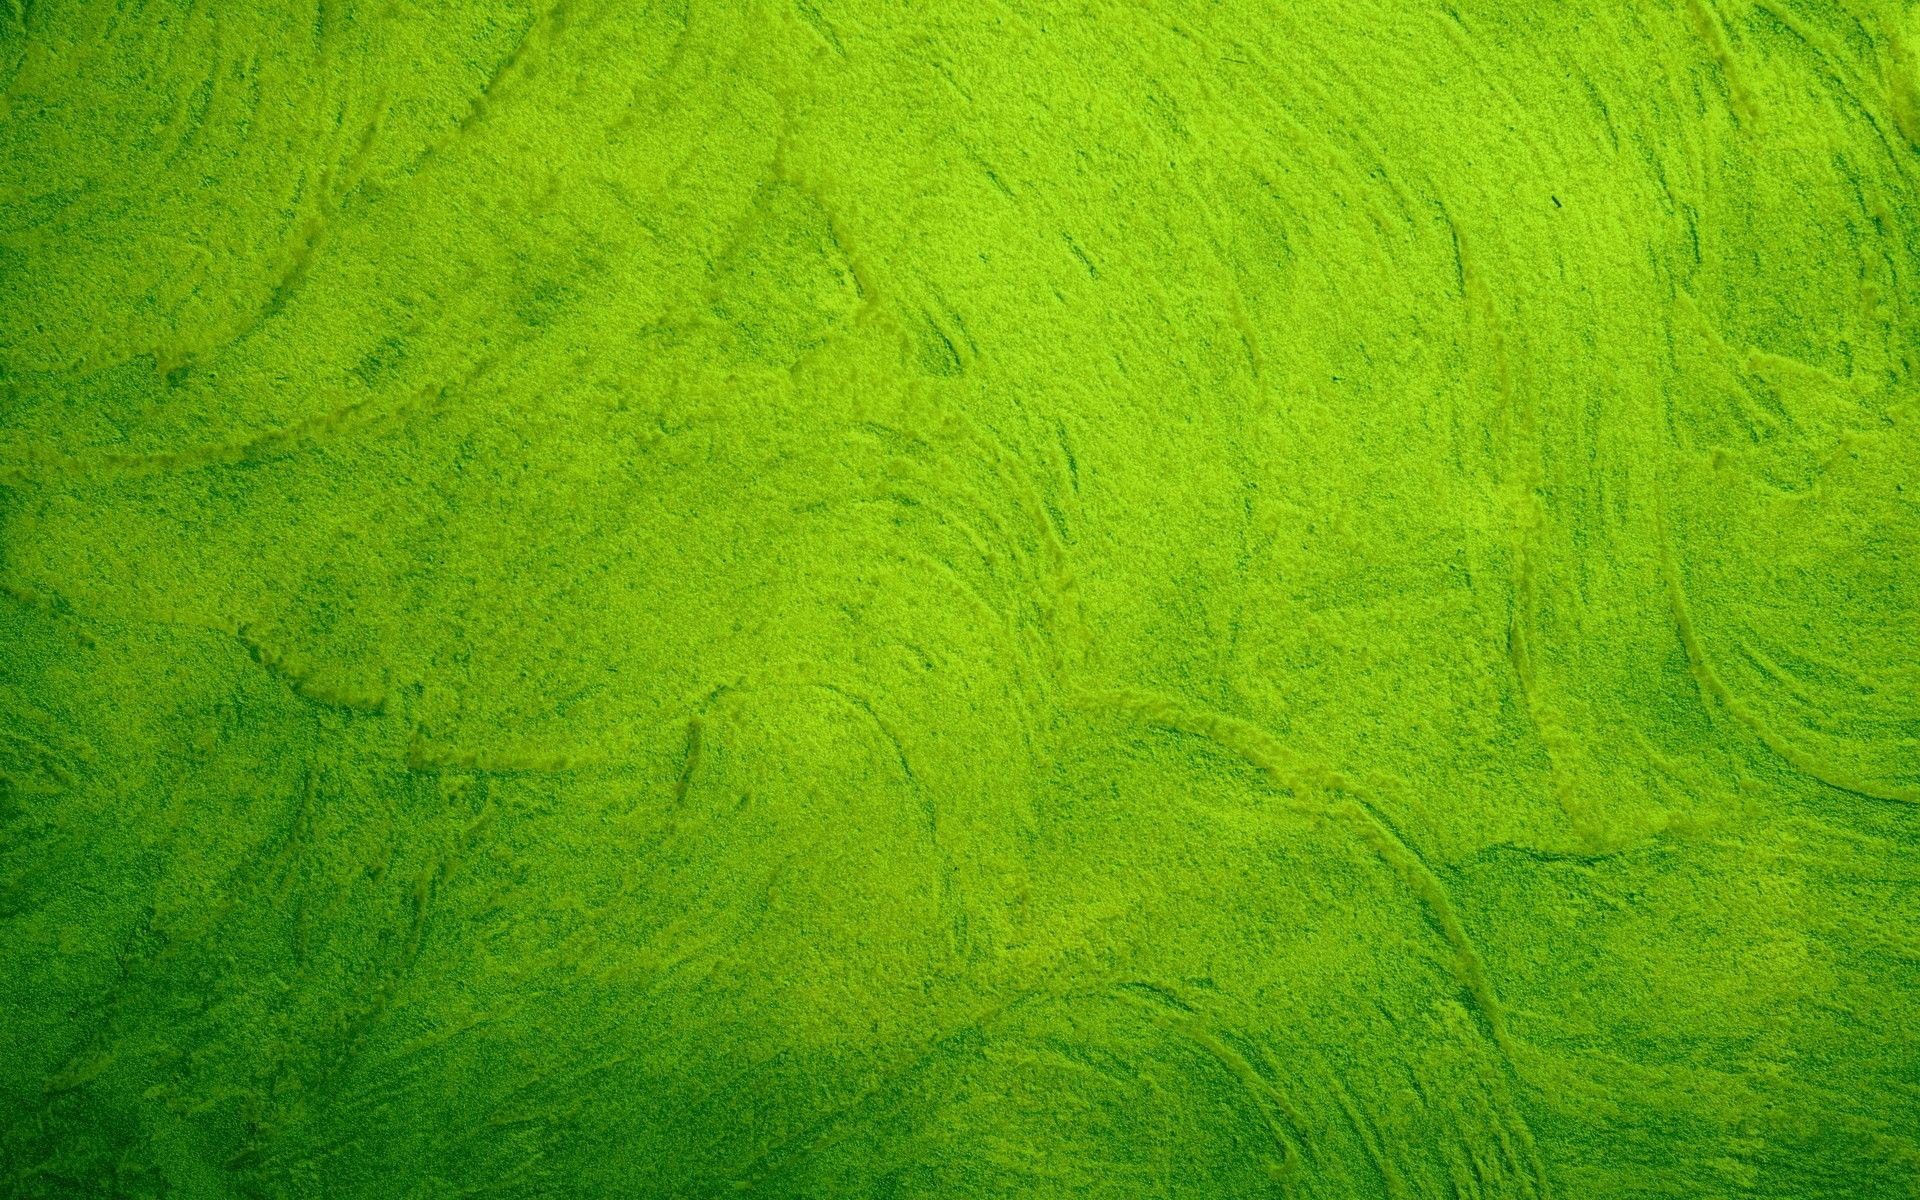 textura-verde-1568.jpg (1920×1200)